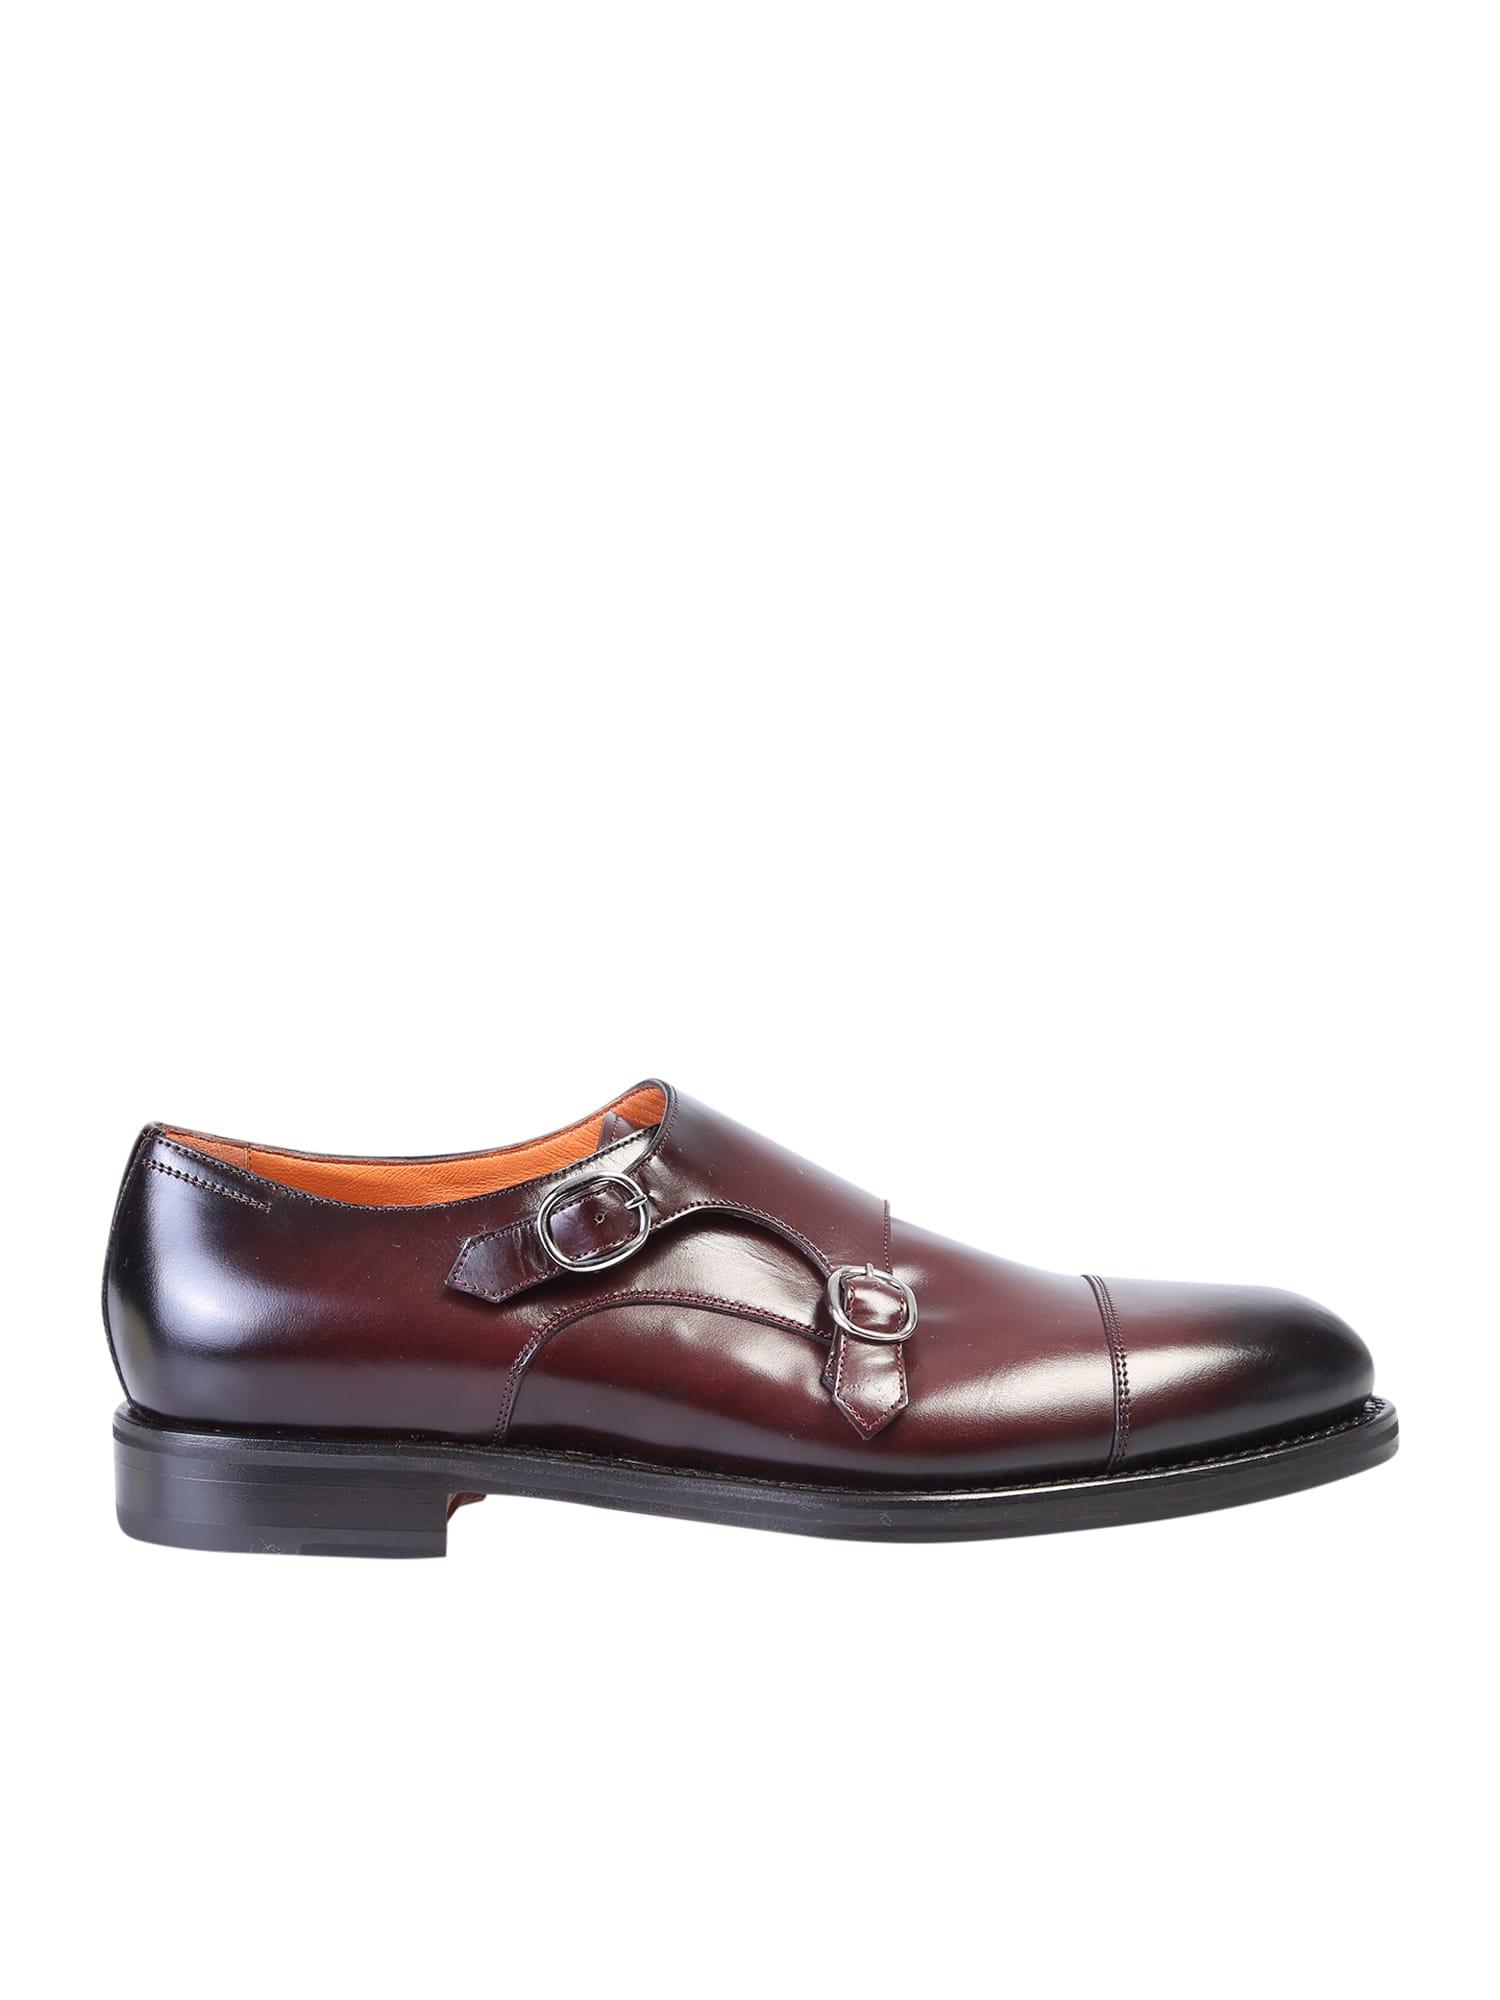 Santoni Shoes MONKSTRAP SHOES